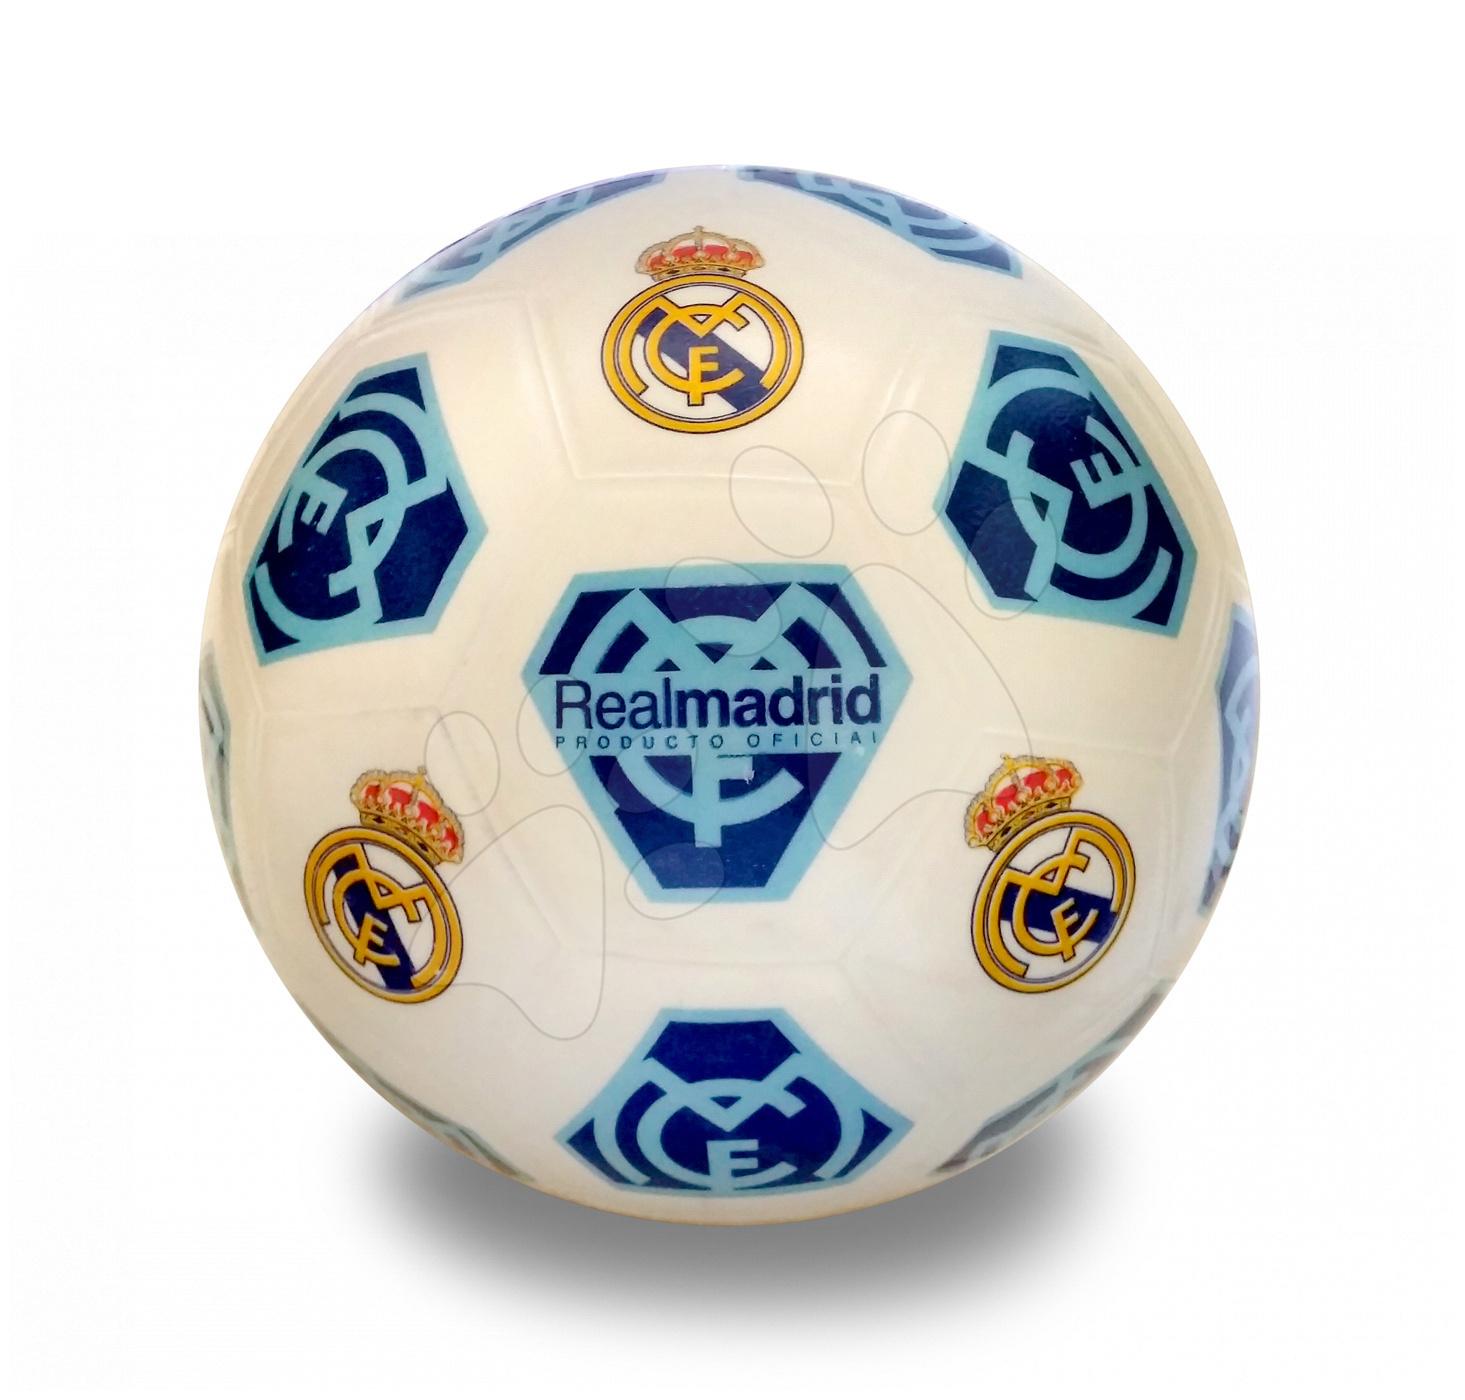 Futbalová lopta Real Madrid Unice 22 cm hrubá guma